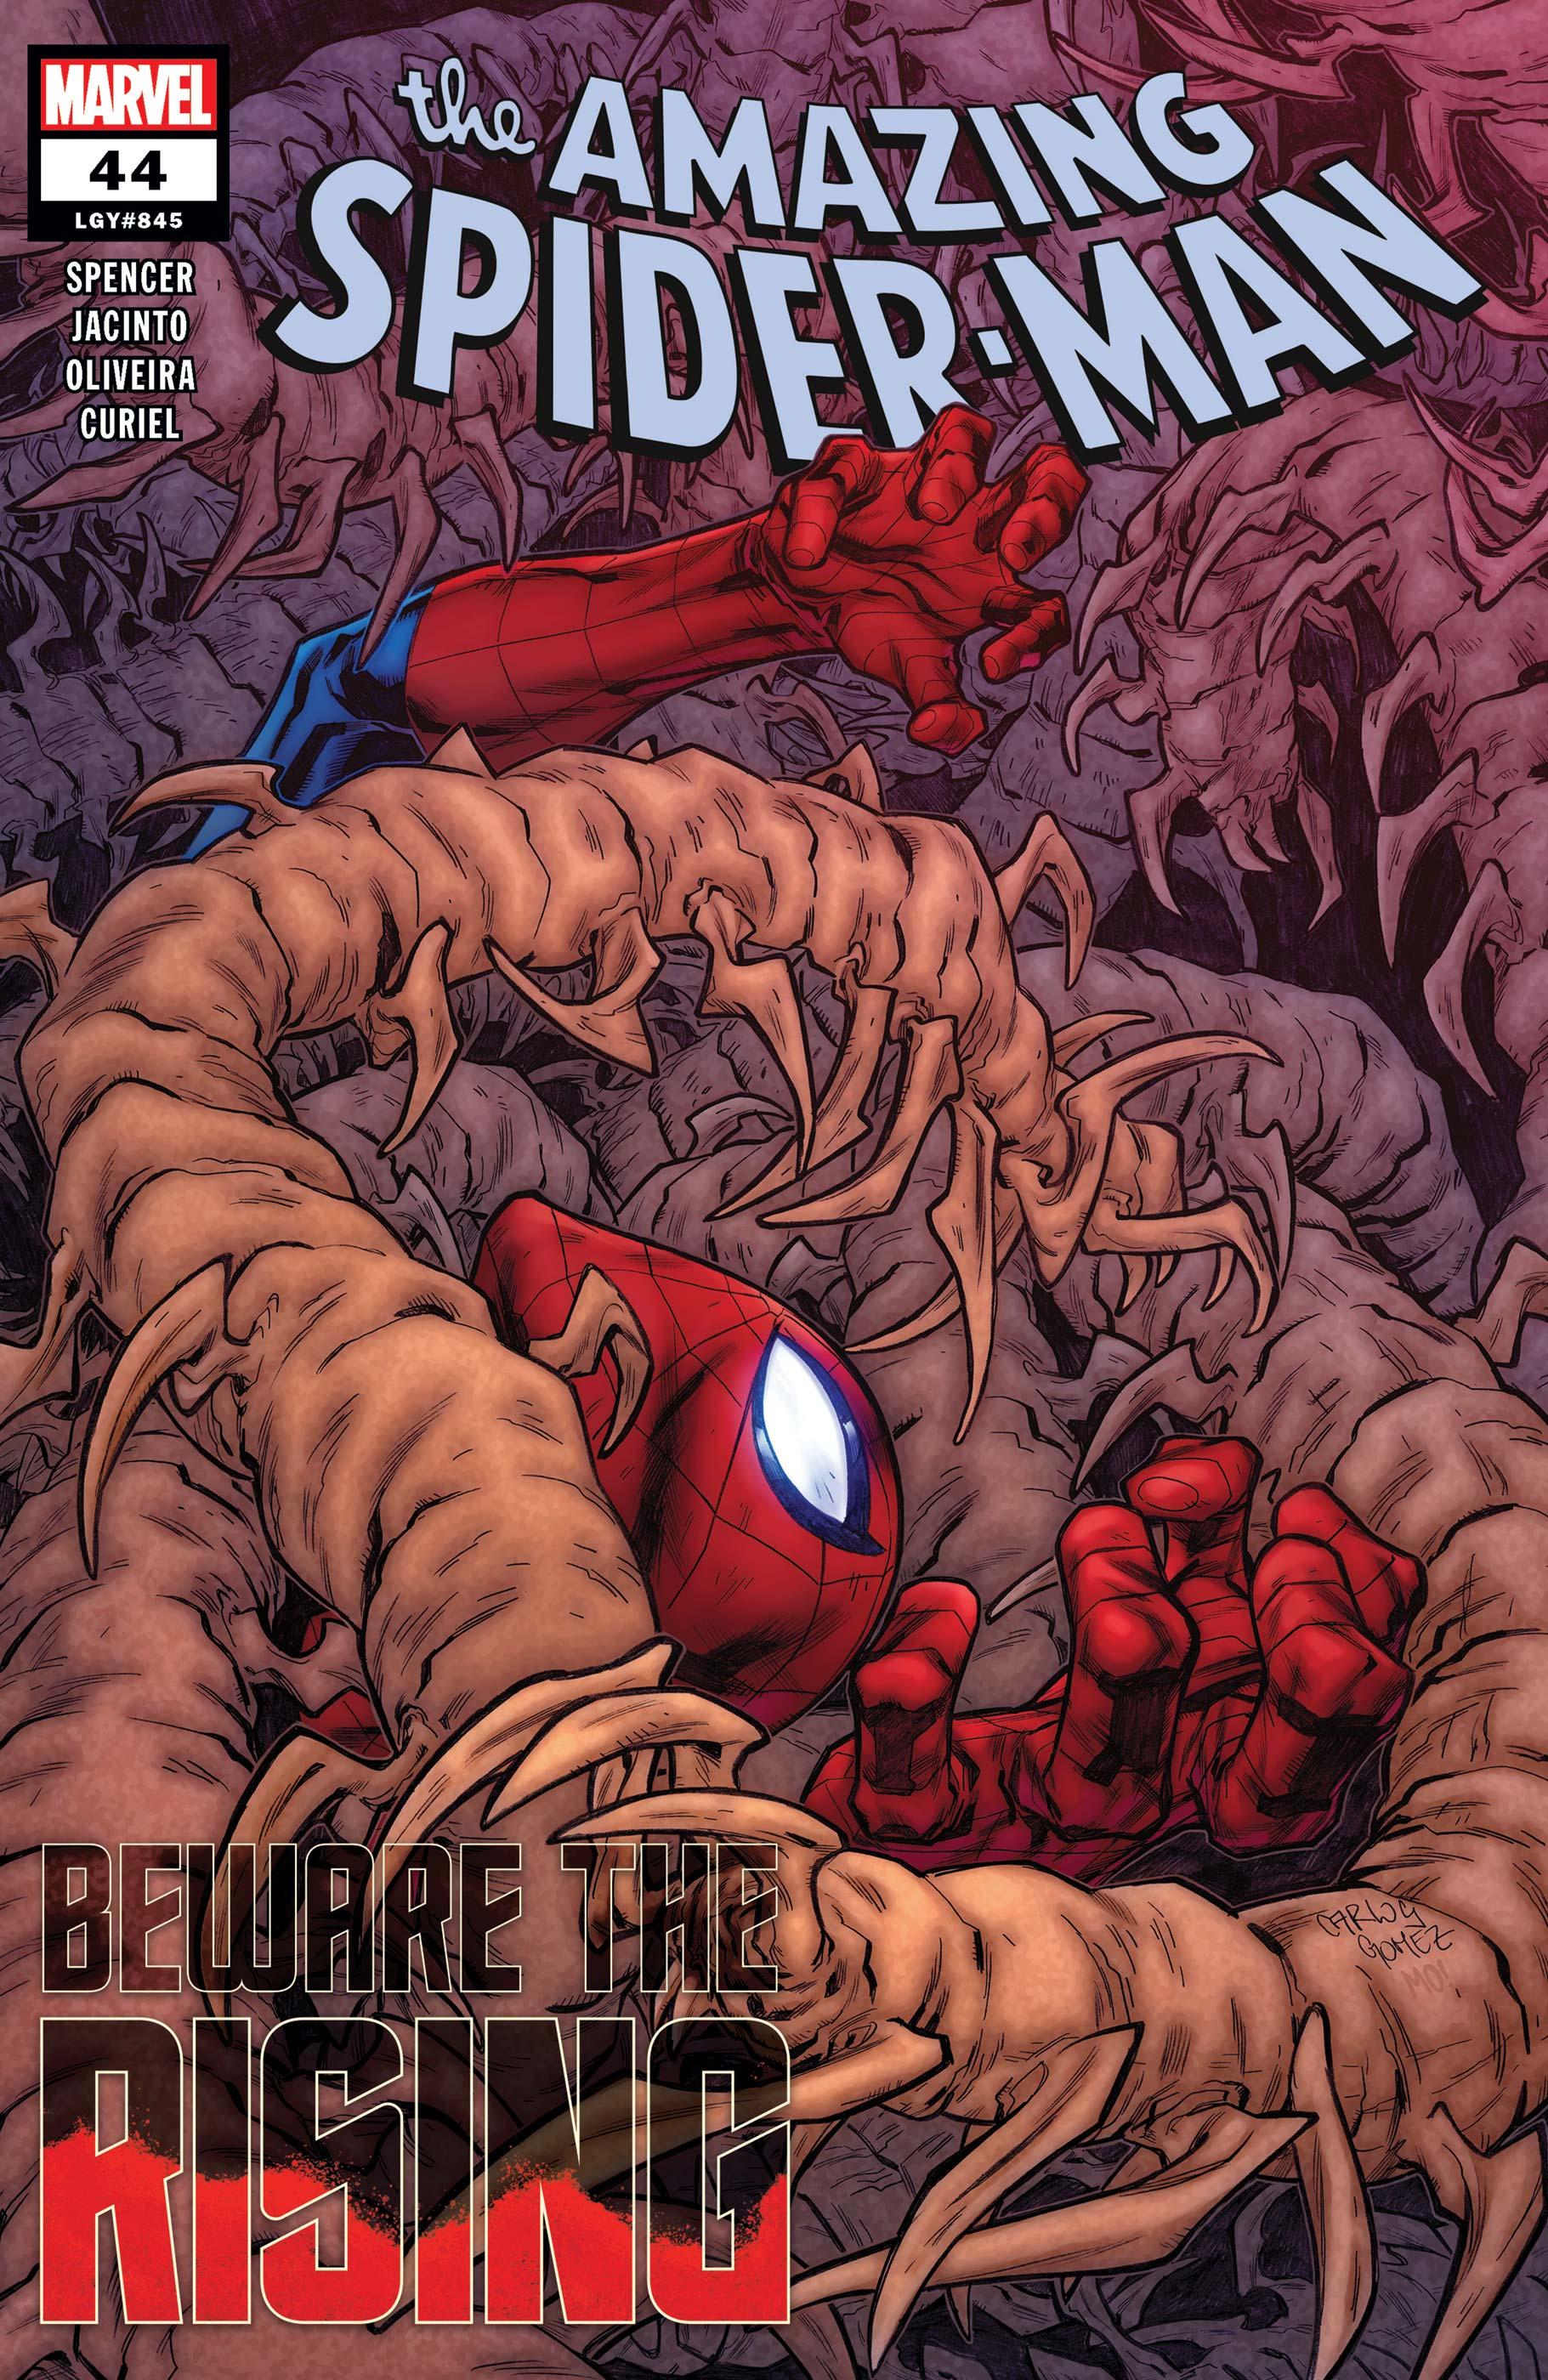 The Amazing Spider-Man (2018) #44